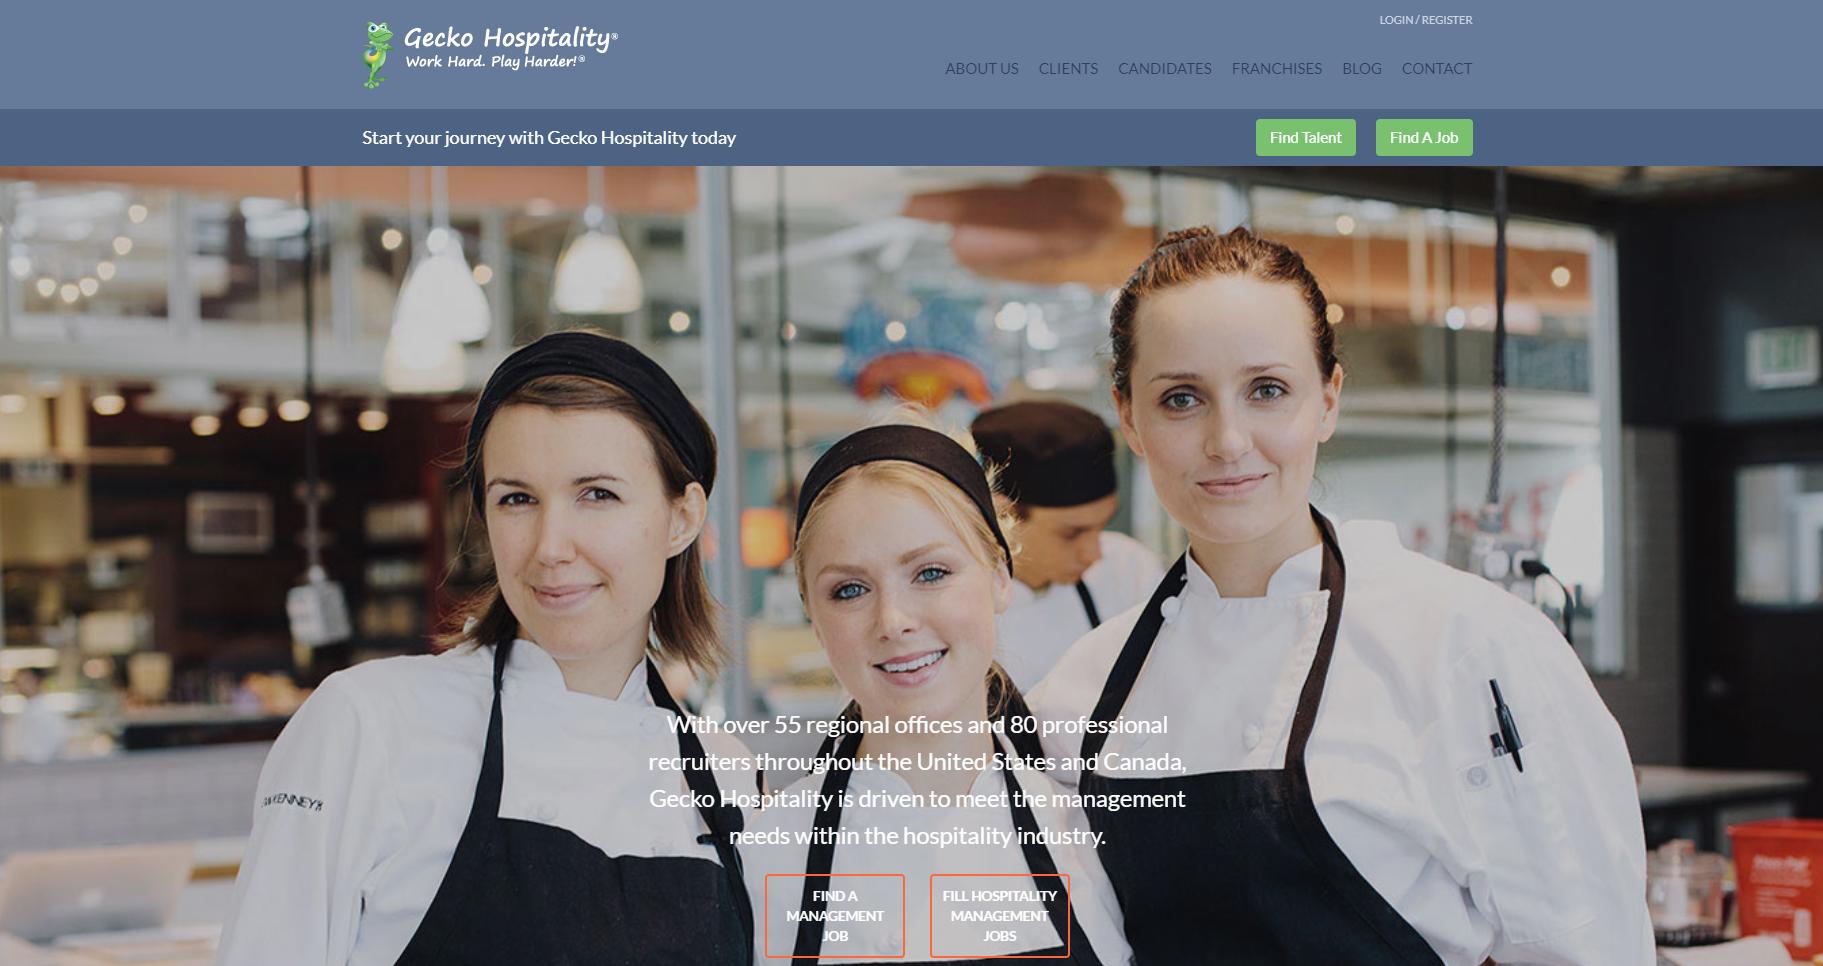 Gecko Hospitality website